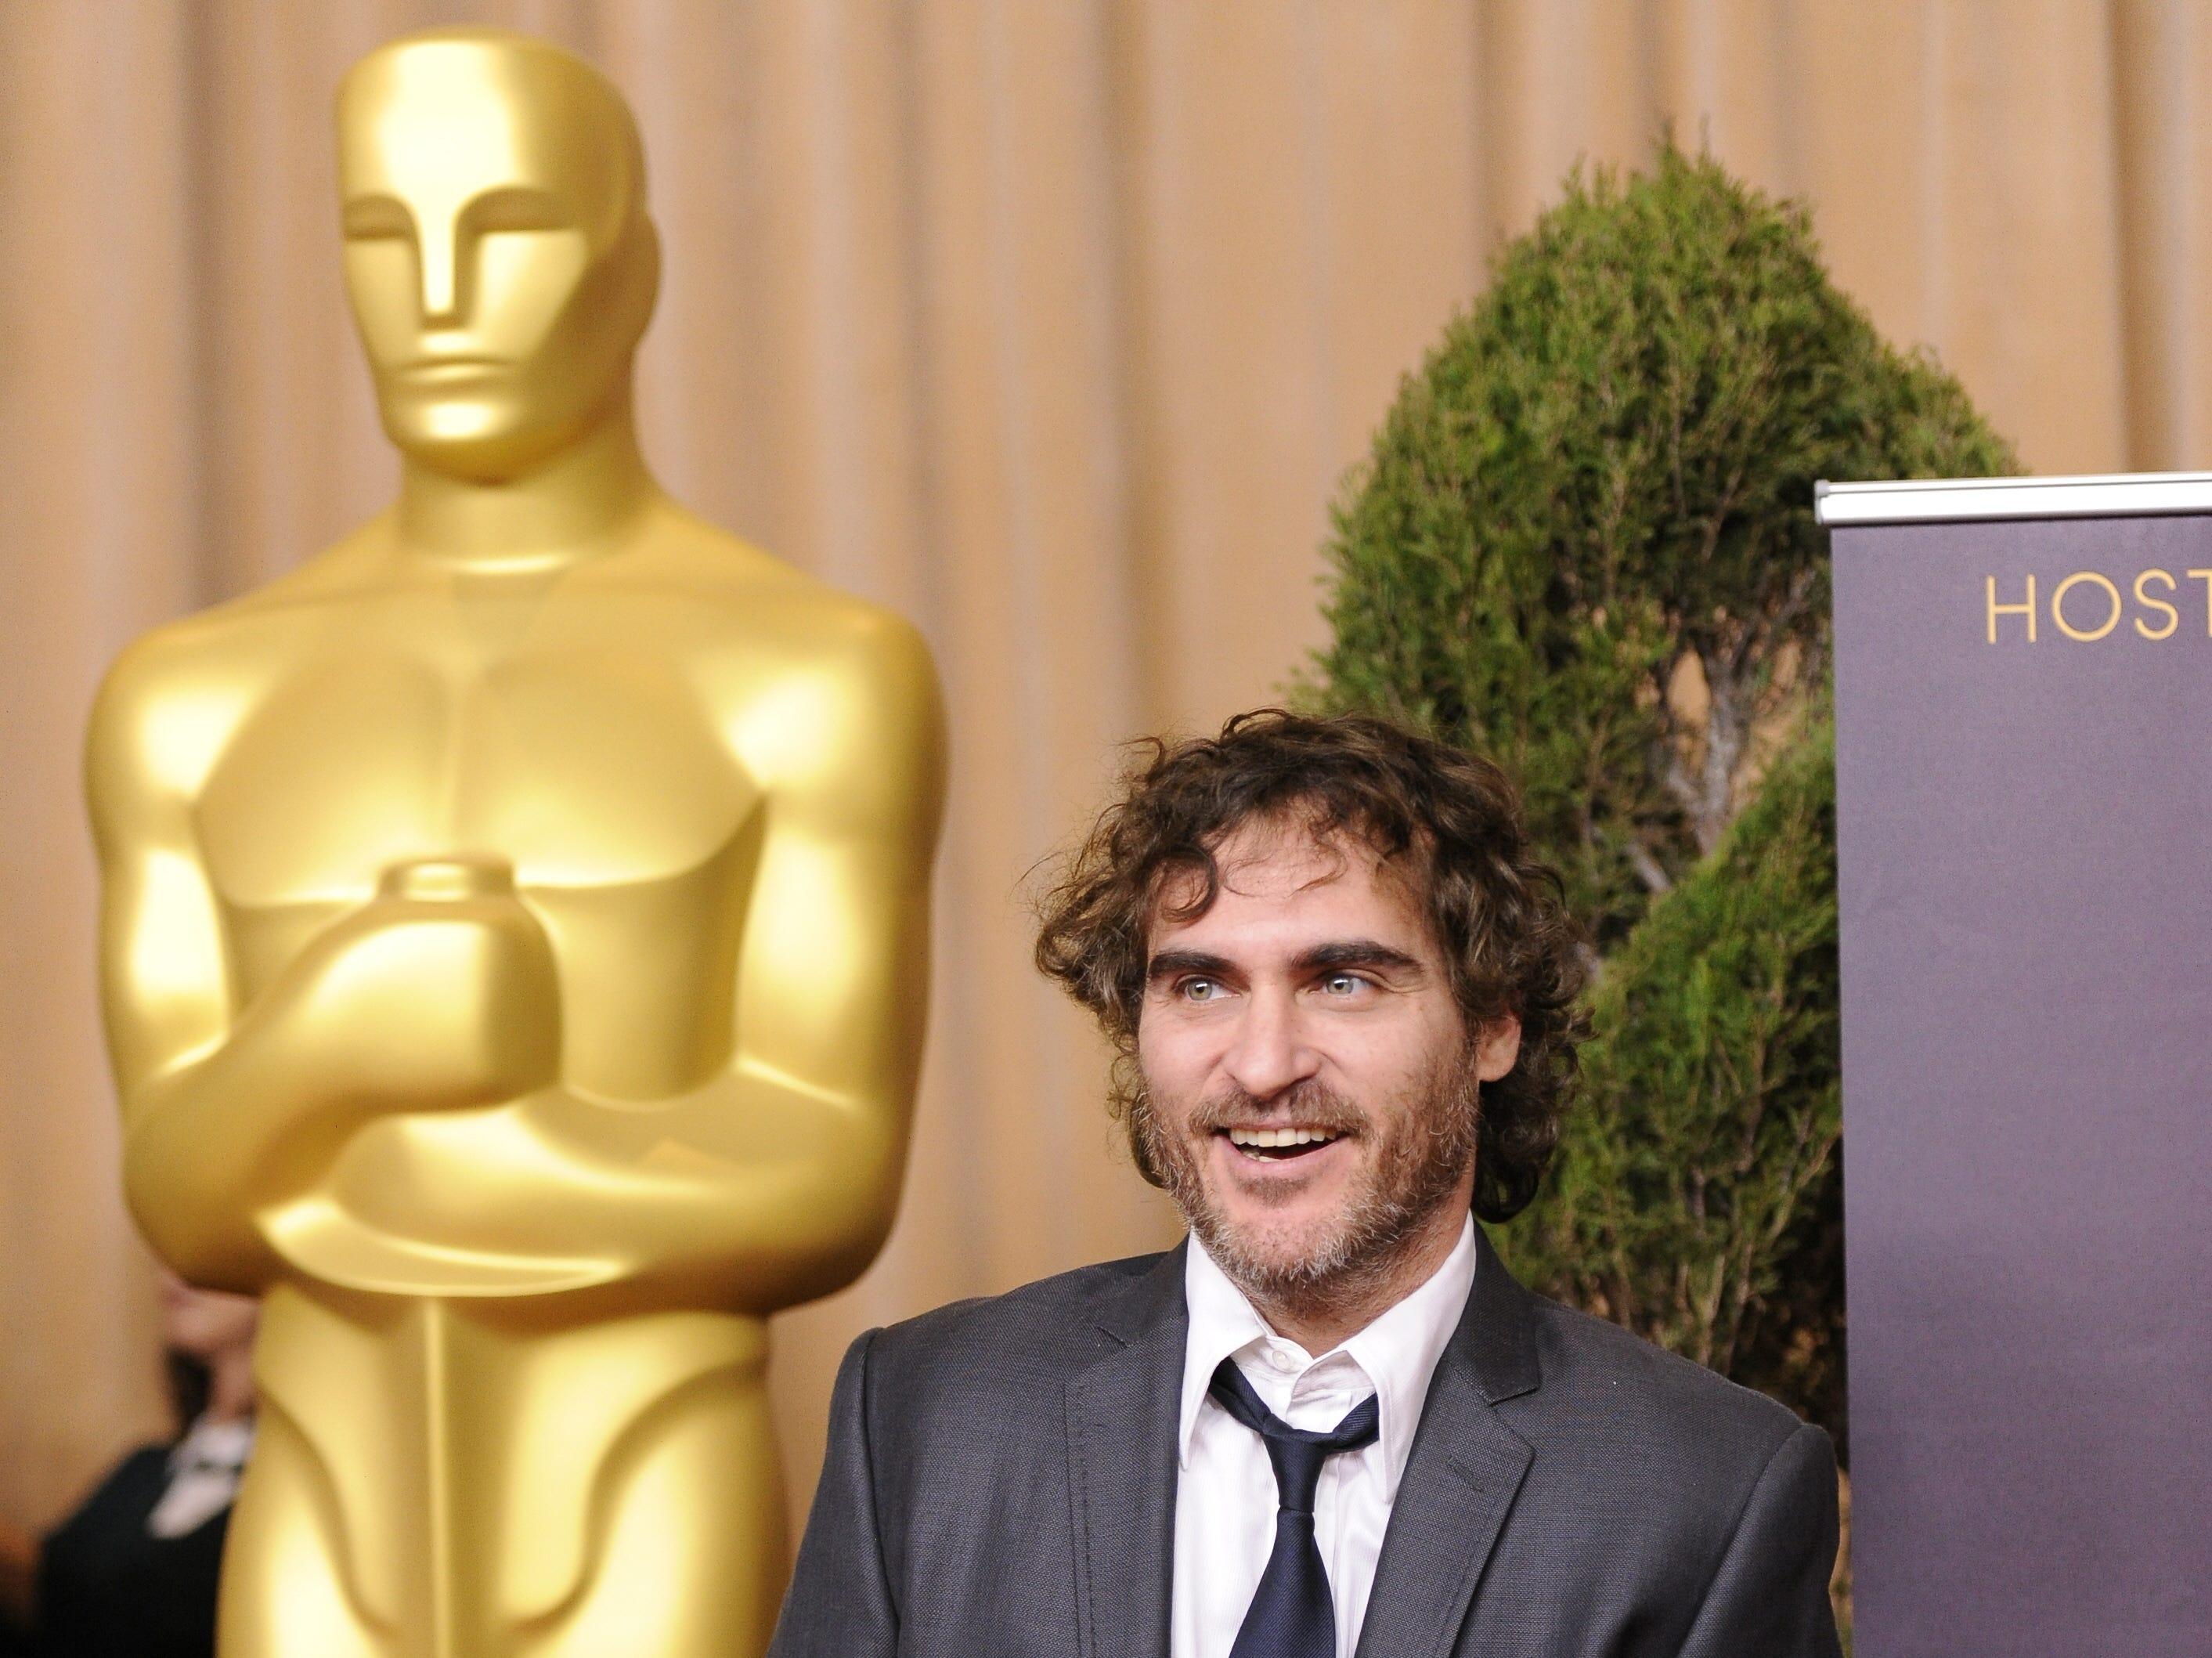 "2/4/13 1:03:44 PM --- ACADEMY AWARDS NOMINEES LUNCHEON --- BEVERLY HILLS, CA: Best actor nominee Joaquin Phoenix (""The Master"") arrives at the Academy Awards nominees luncheon held at the Beverly Hilton Hotel. Photo by Robert Hanashiro, USA TODAY Staff  ORG XMIT: RH 42993 OSCAR LUNCHEON 2/4/2013  [Via MerlinFTP Drop]"